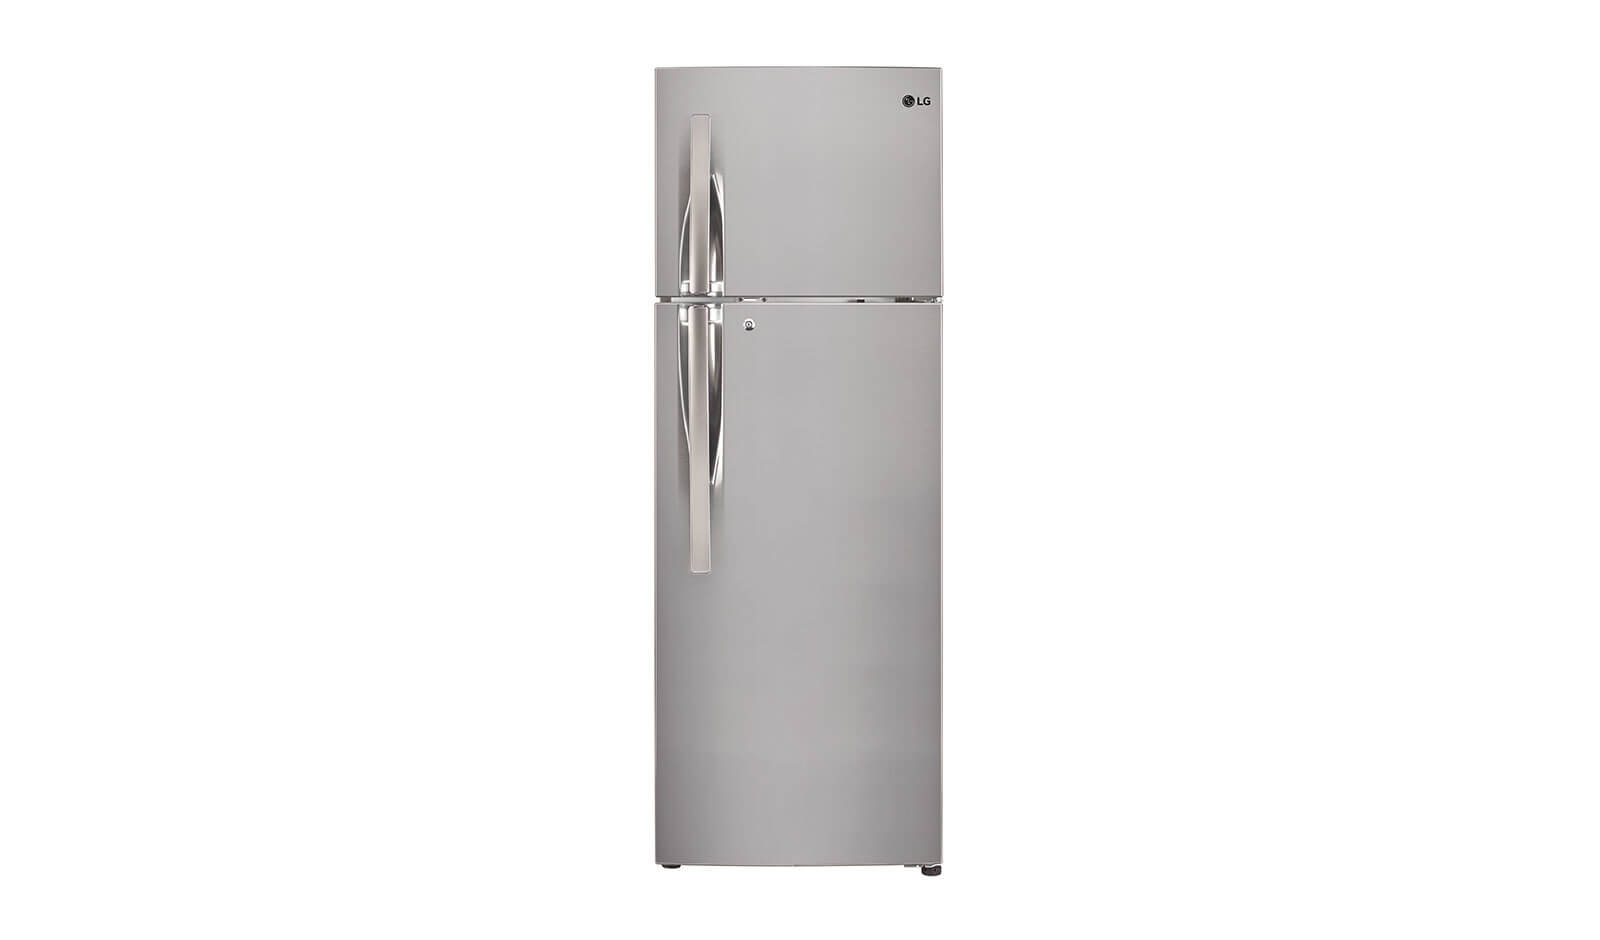 LG 284 L 4 Star Frost-Free Double-Door Refrigerator (GL-T302RPZN, Shiny Steel)